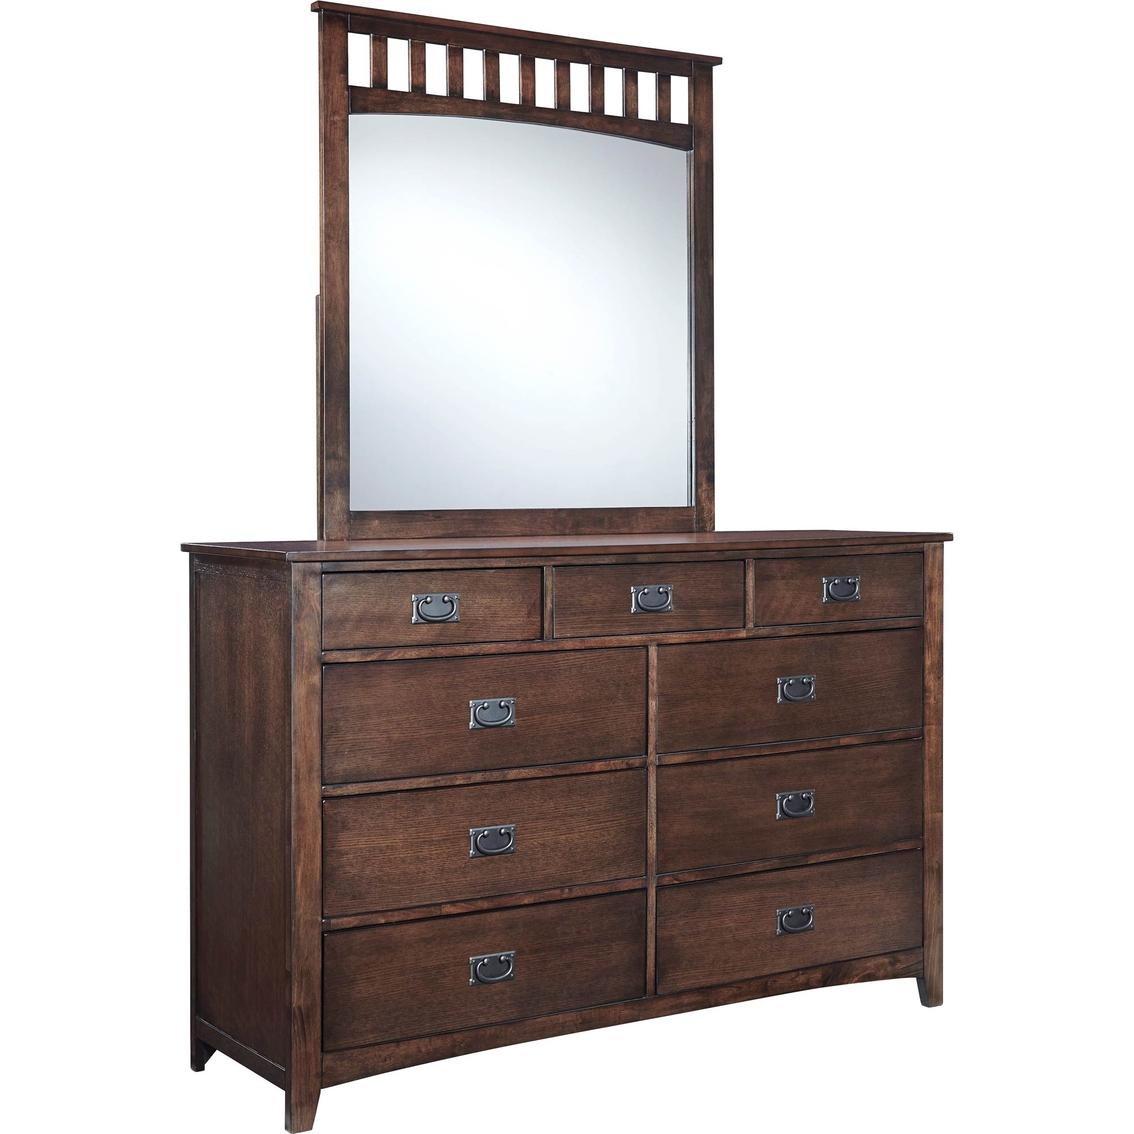 Ashley strenton dresser and mirror dressers home for 12 inch depth dresser